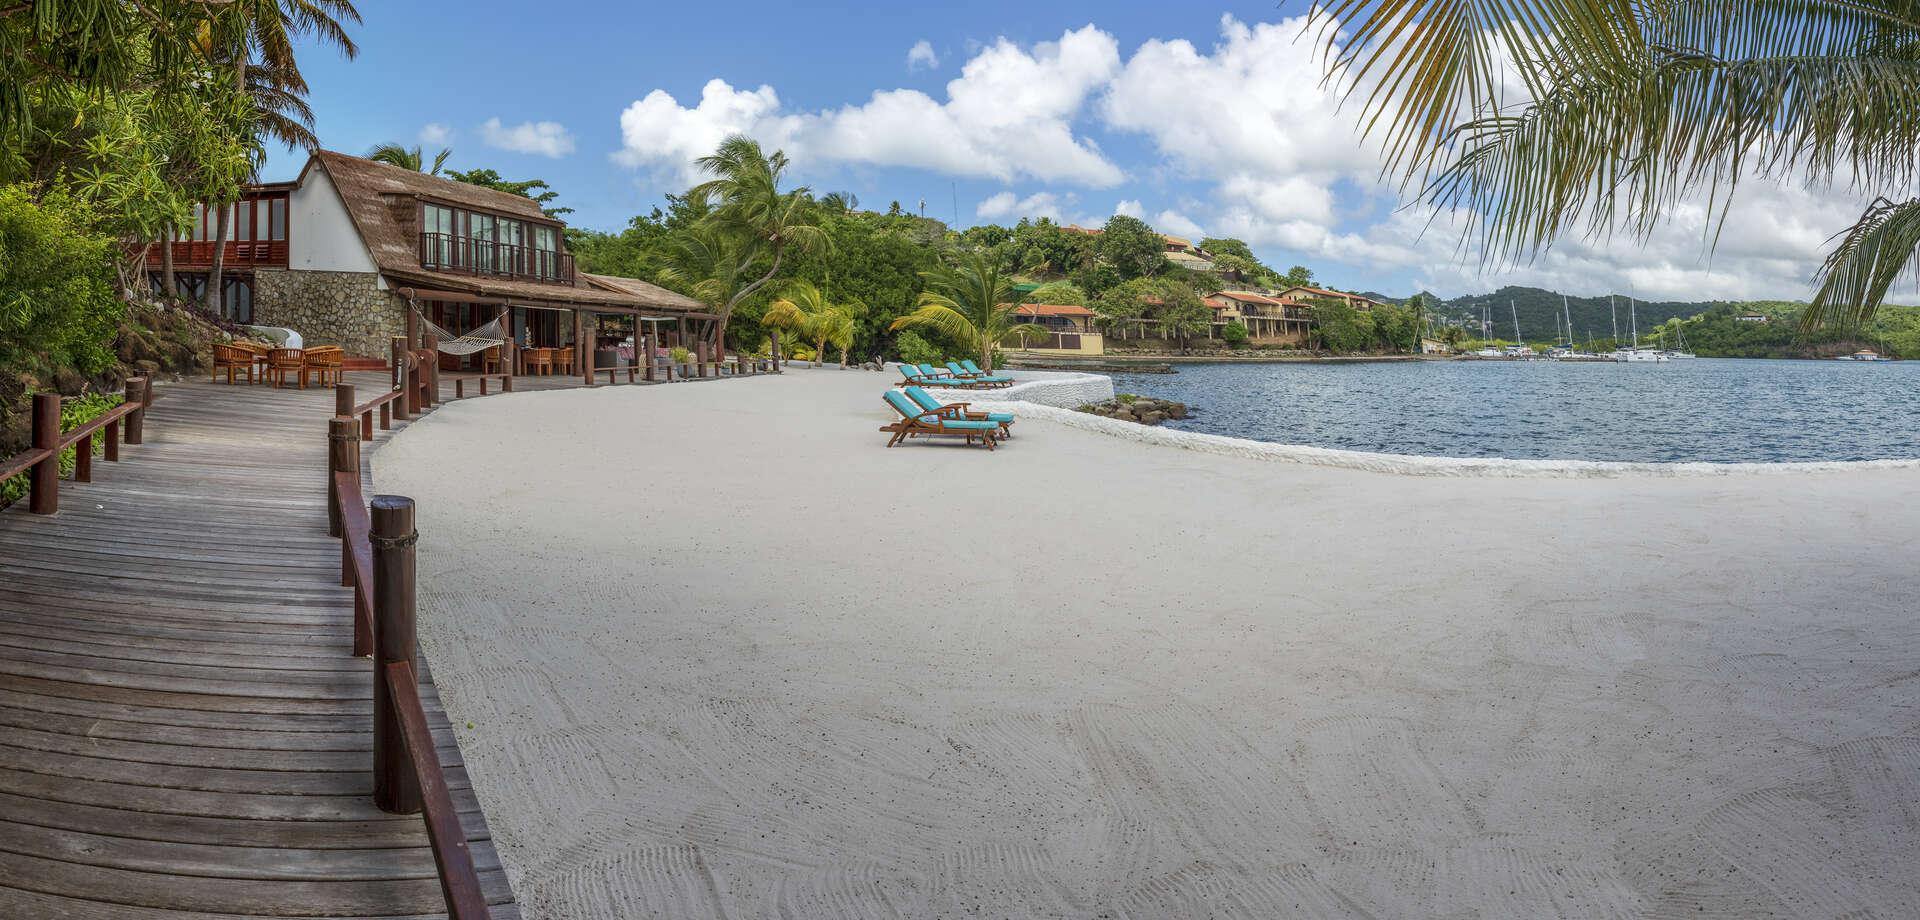 Luxury villa rentals caribbean - Grenada - Lanse aux epines - Mount Hartman Bay Beach House - Image 1/15